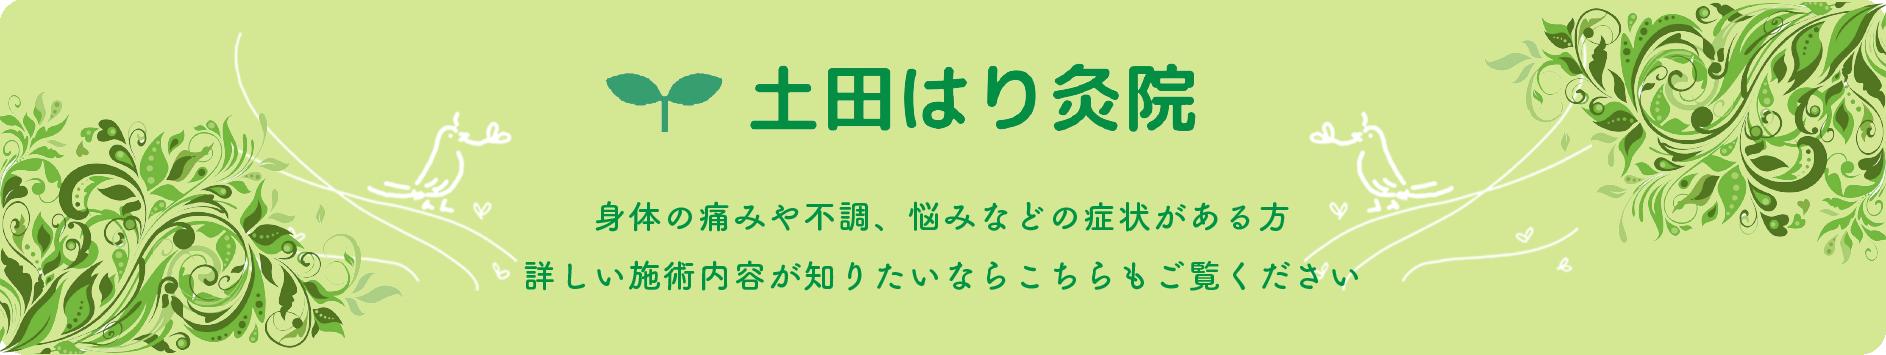 tuchitabanaar - メニュー・料金